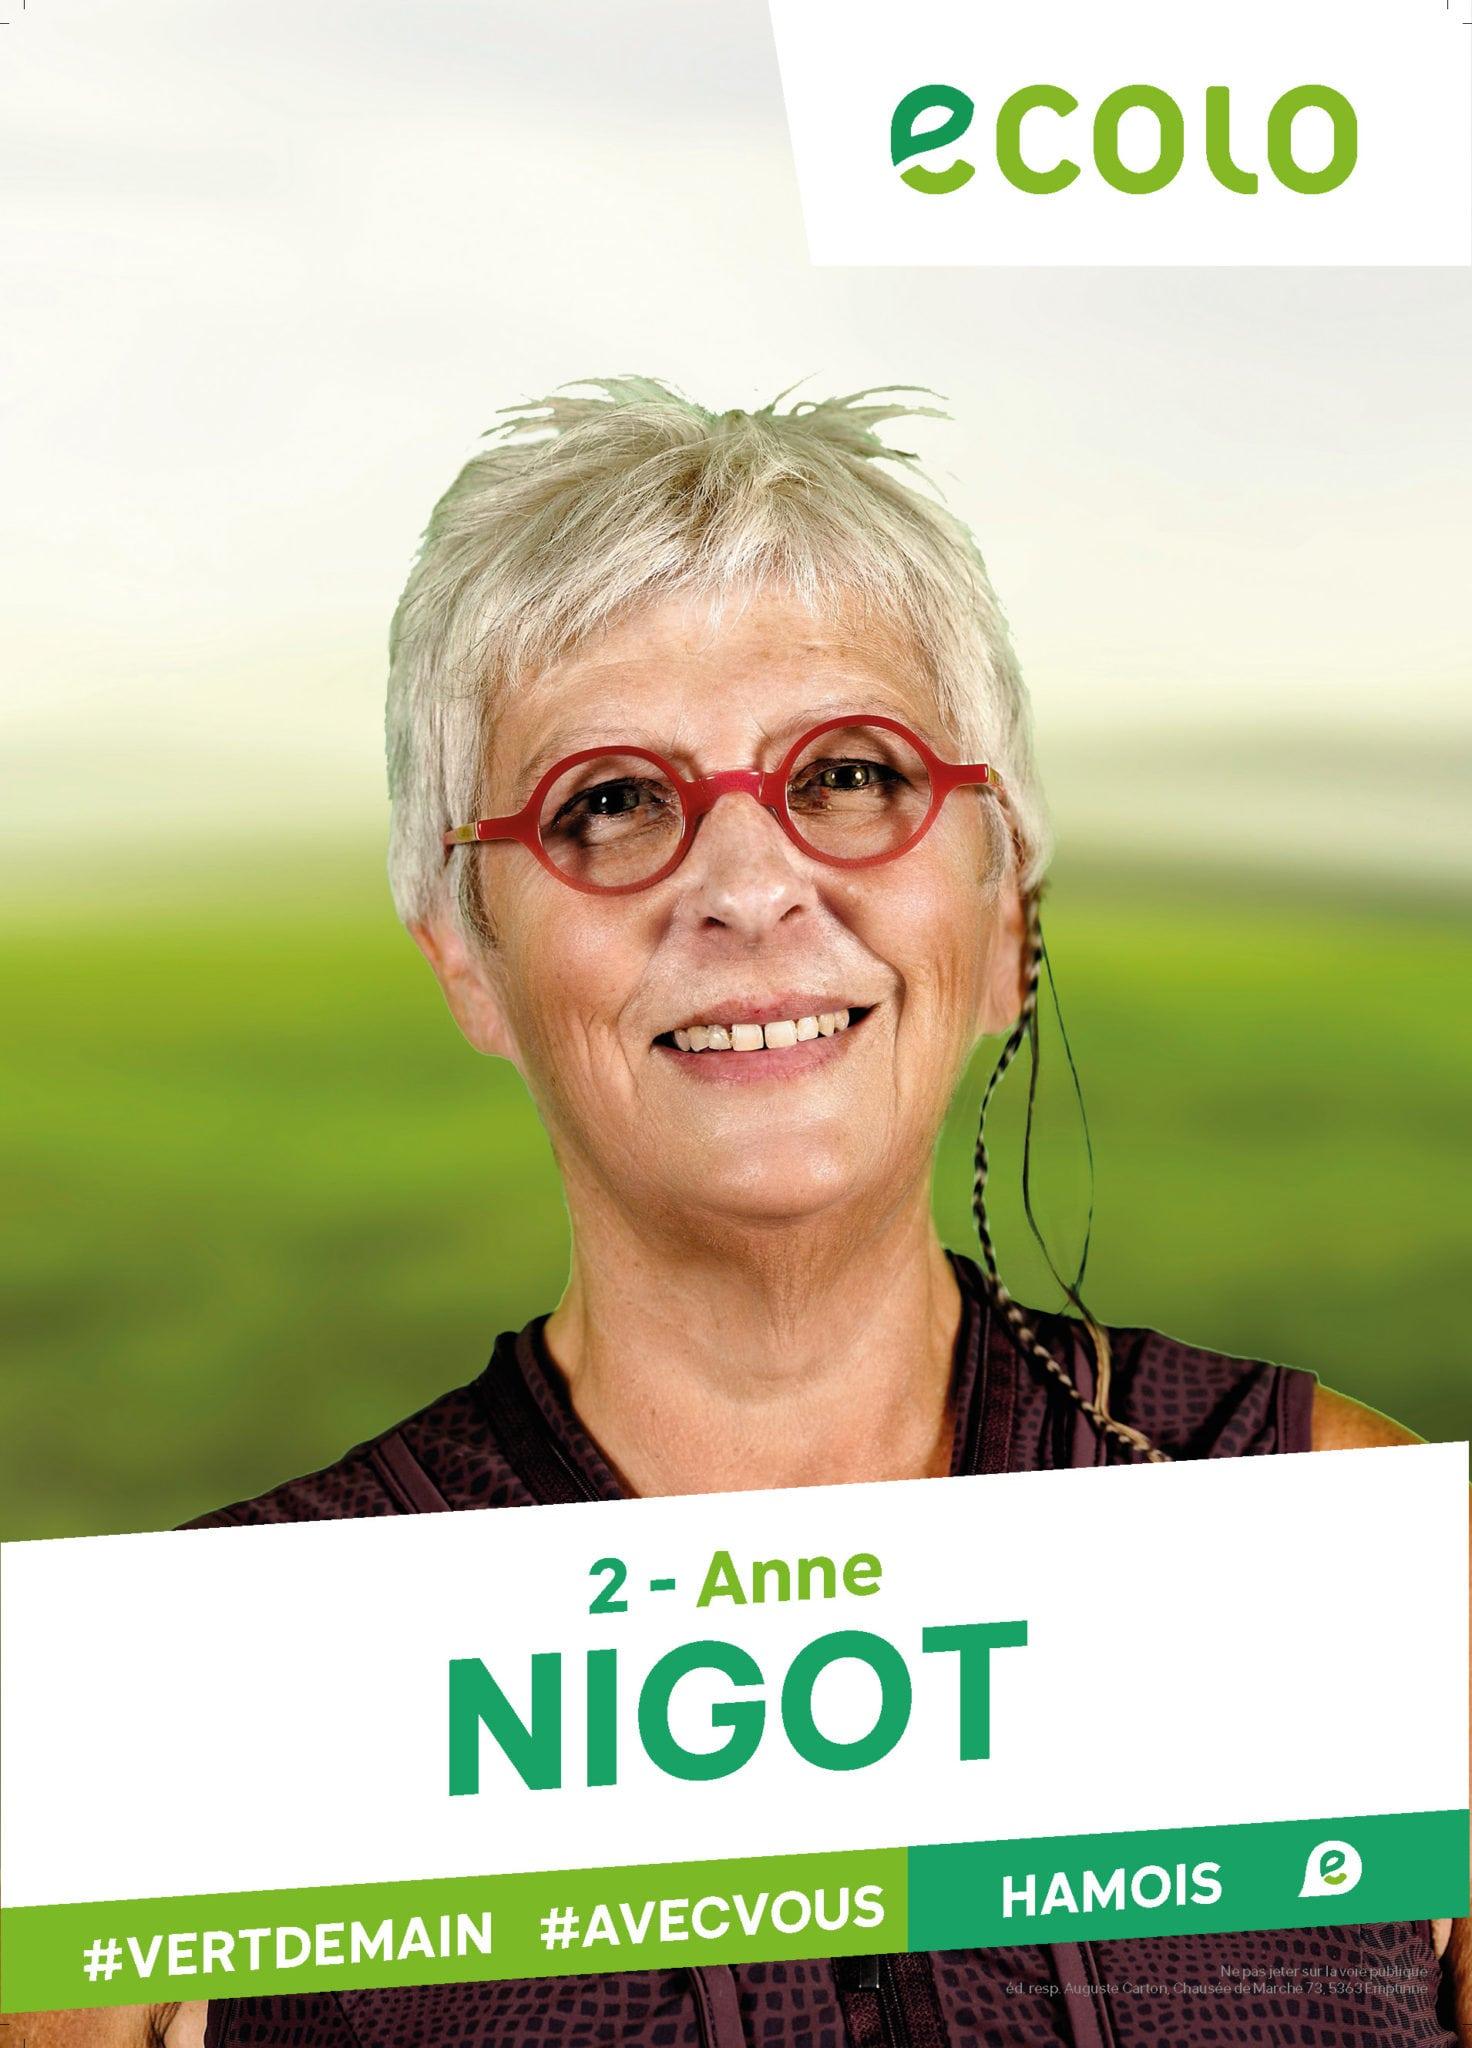 2 - Anne NIGOT